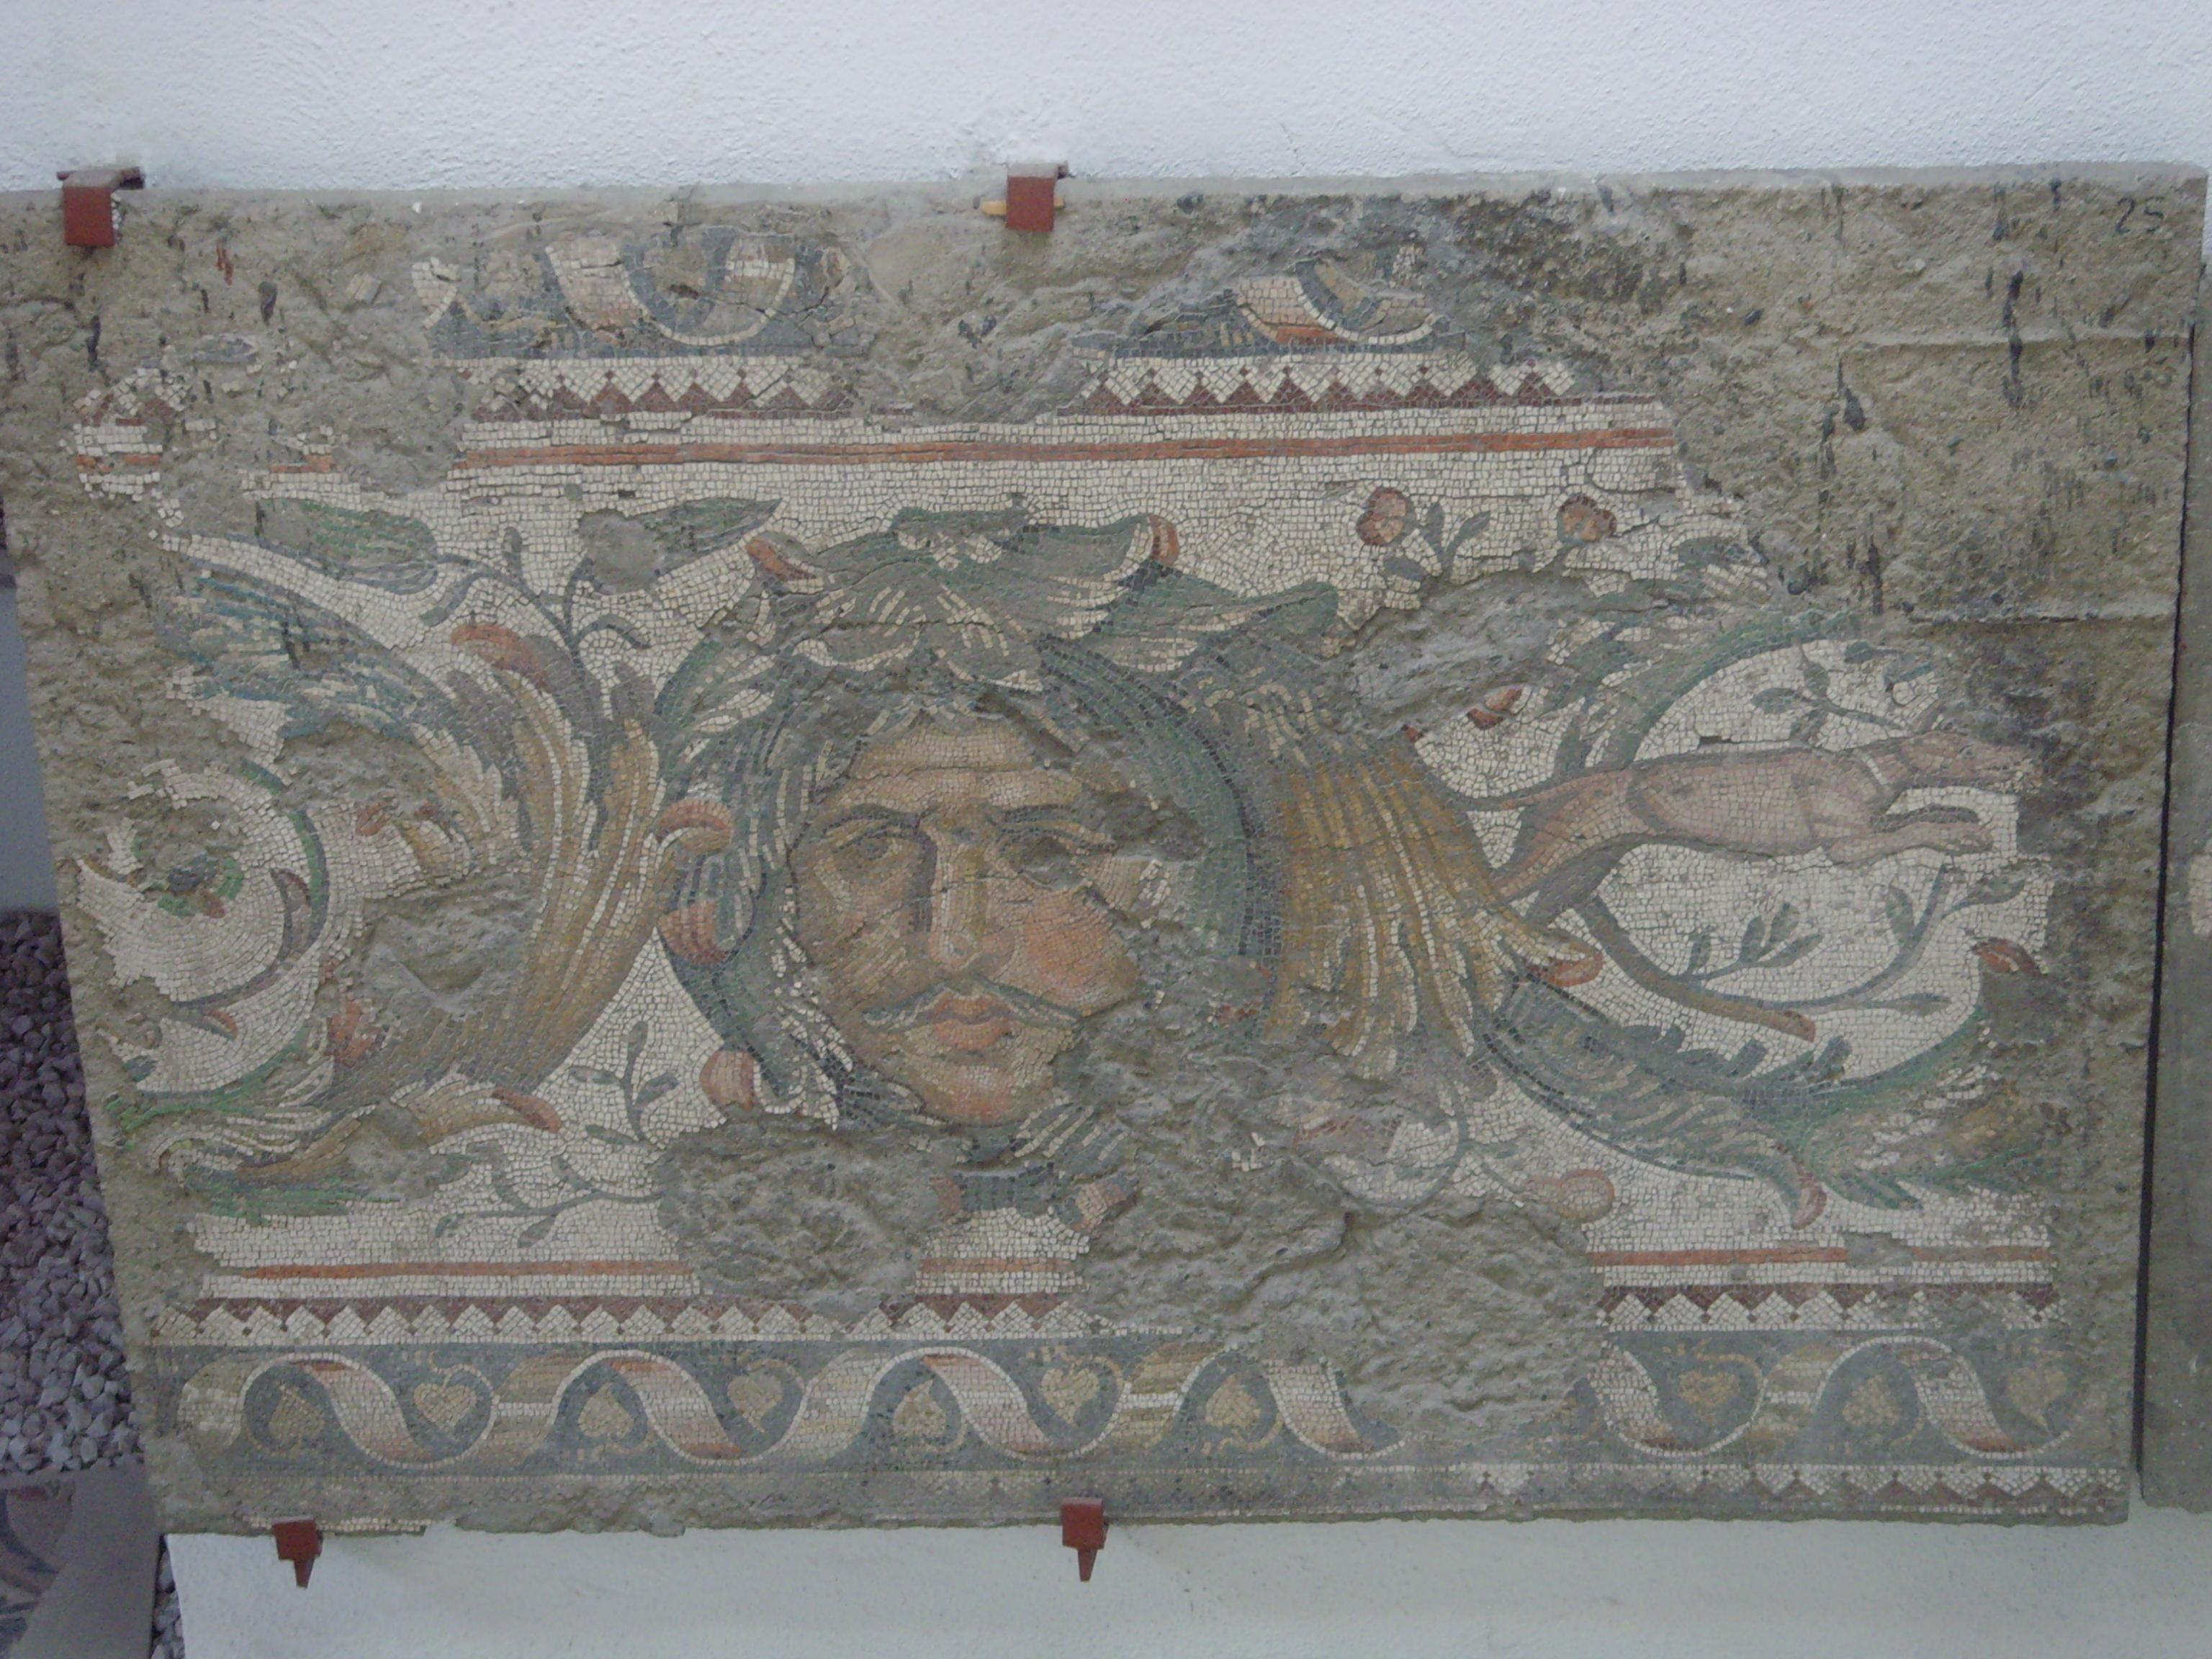 Museum Mosaics Istanbul File:istanbul Mosaic Museum